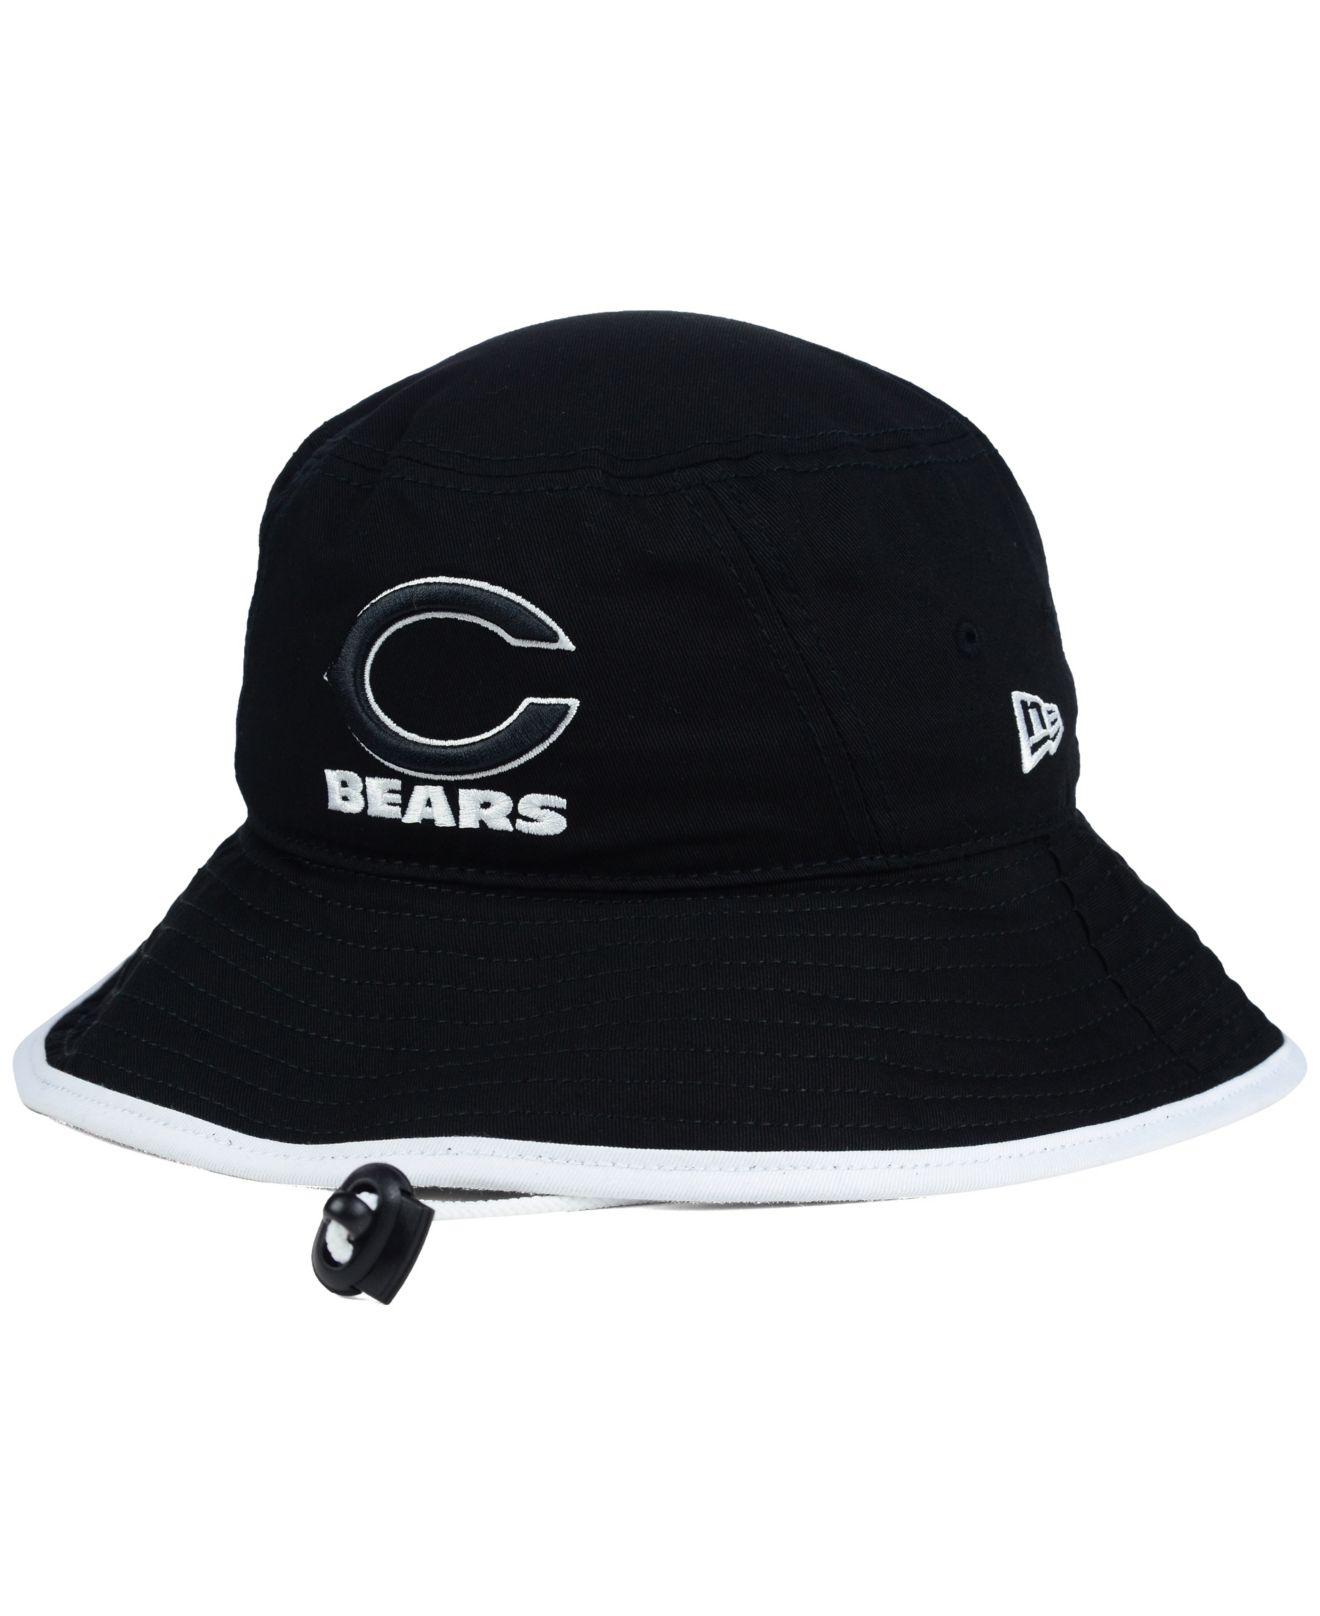 Lyst - KTZ Chicago Bears Nfl Black White Bucket Hat in Black a6909f85b